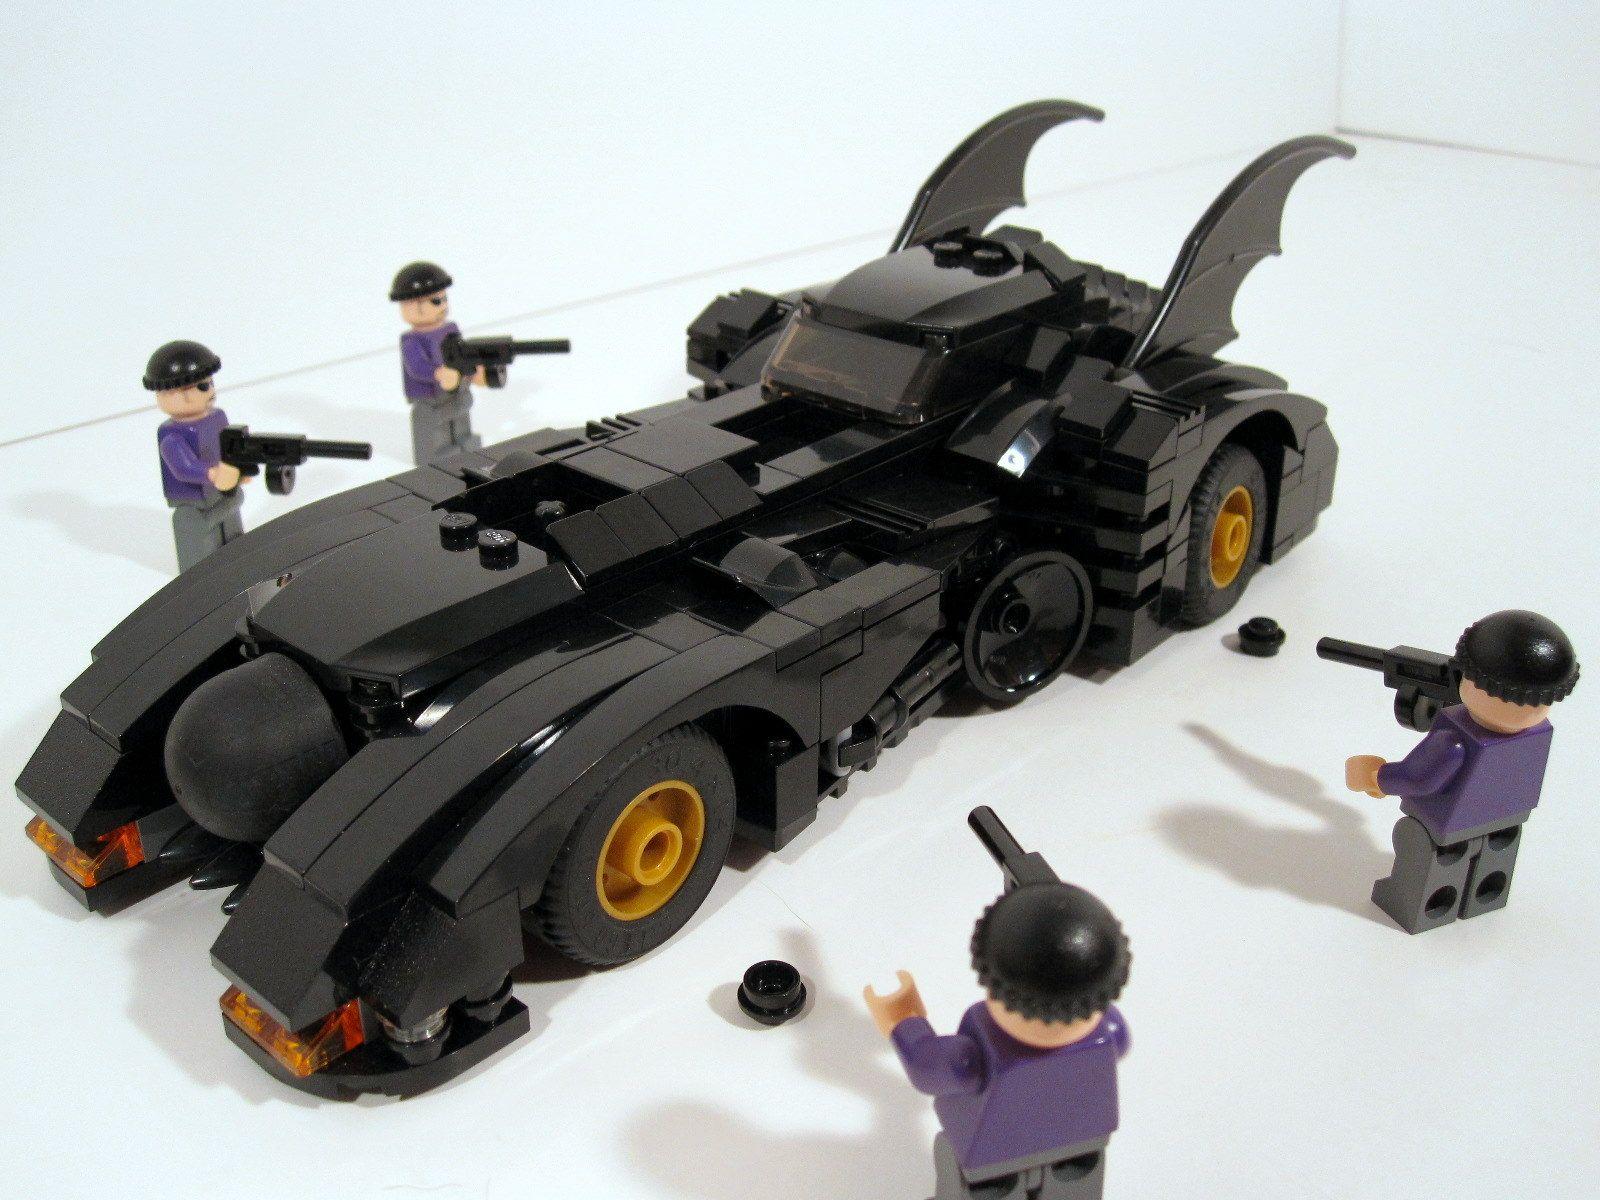 lego batmobile from tim burton 39 s batman lego lego batmobile lego lego tumbler. Black Bedroom Furniture Sets. Home Design Ideas